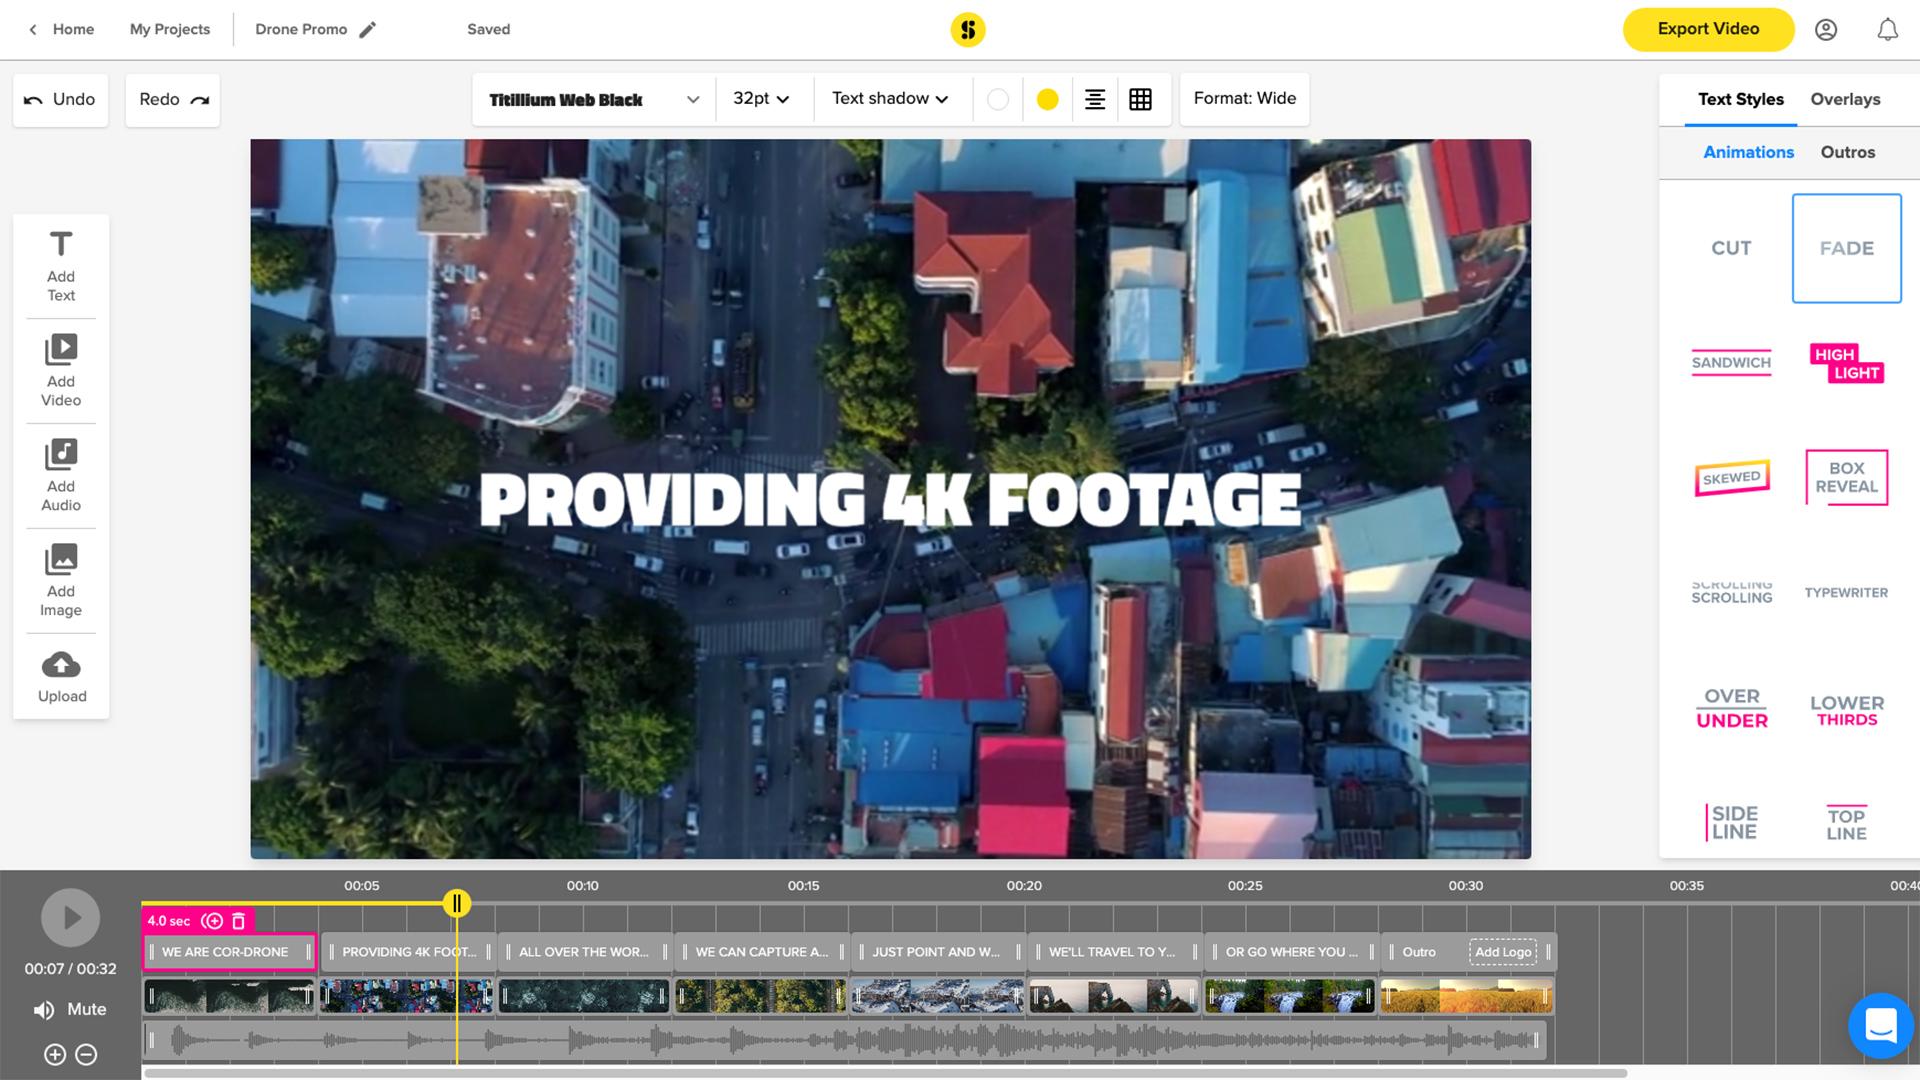 Storyblocks Maker video creation tool. Image: Storyblocks.